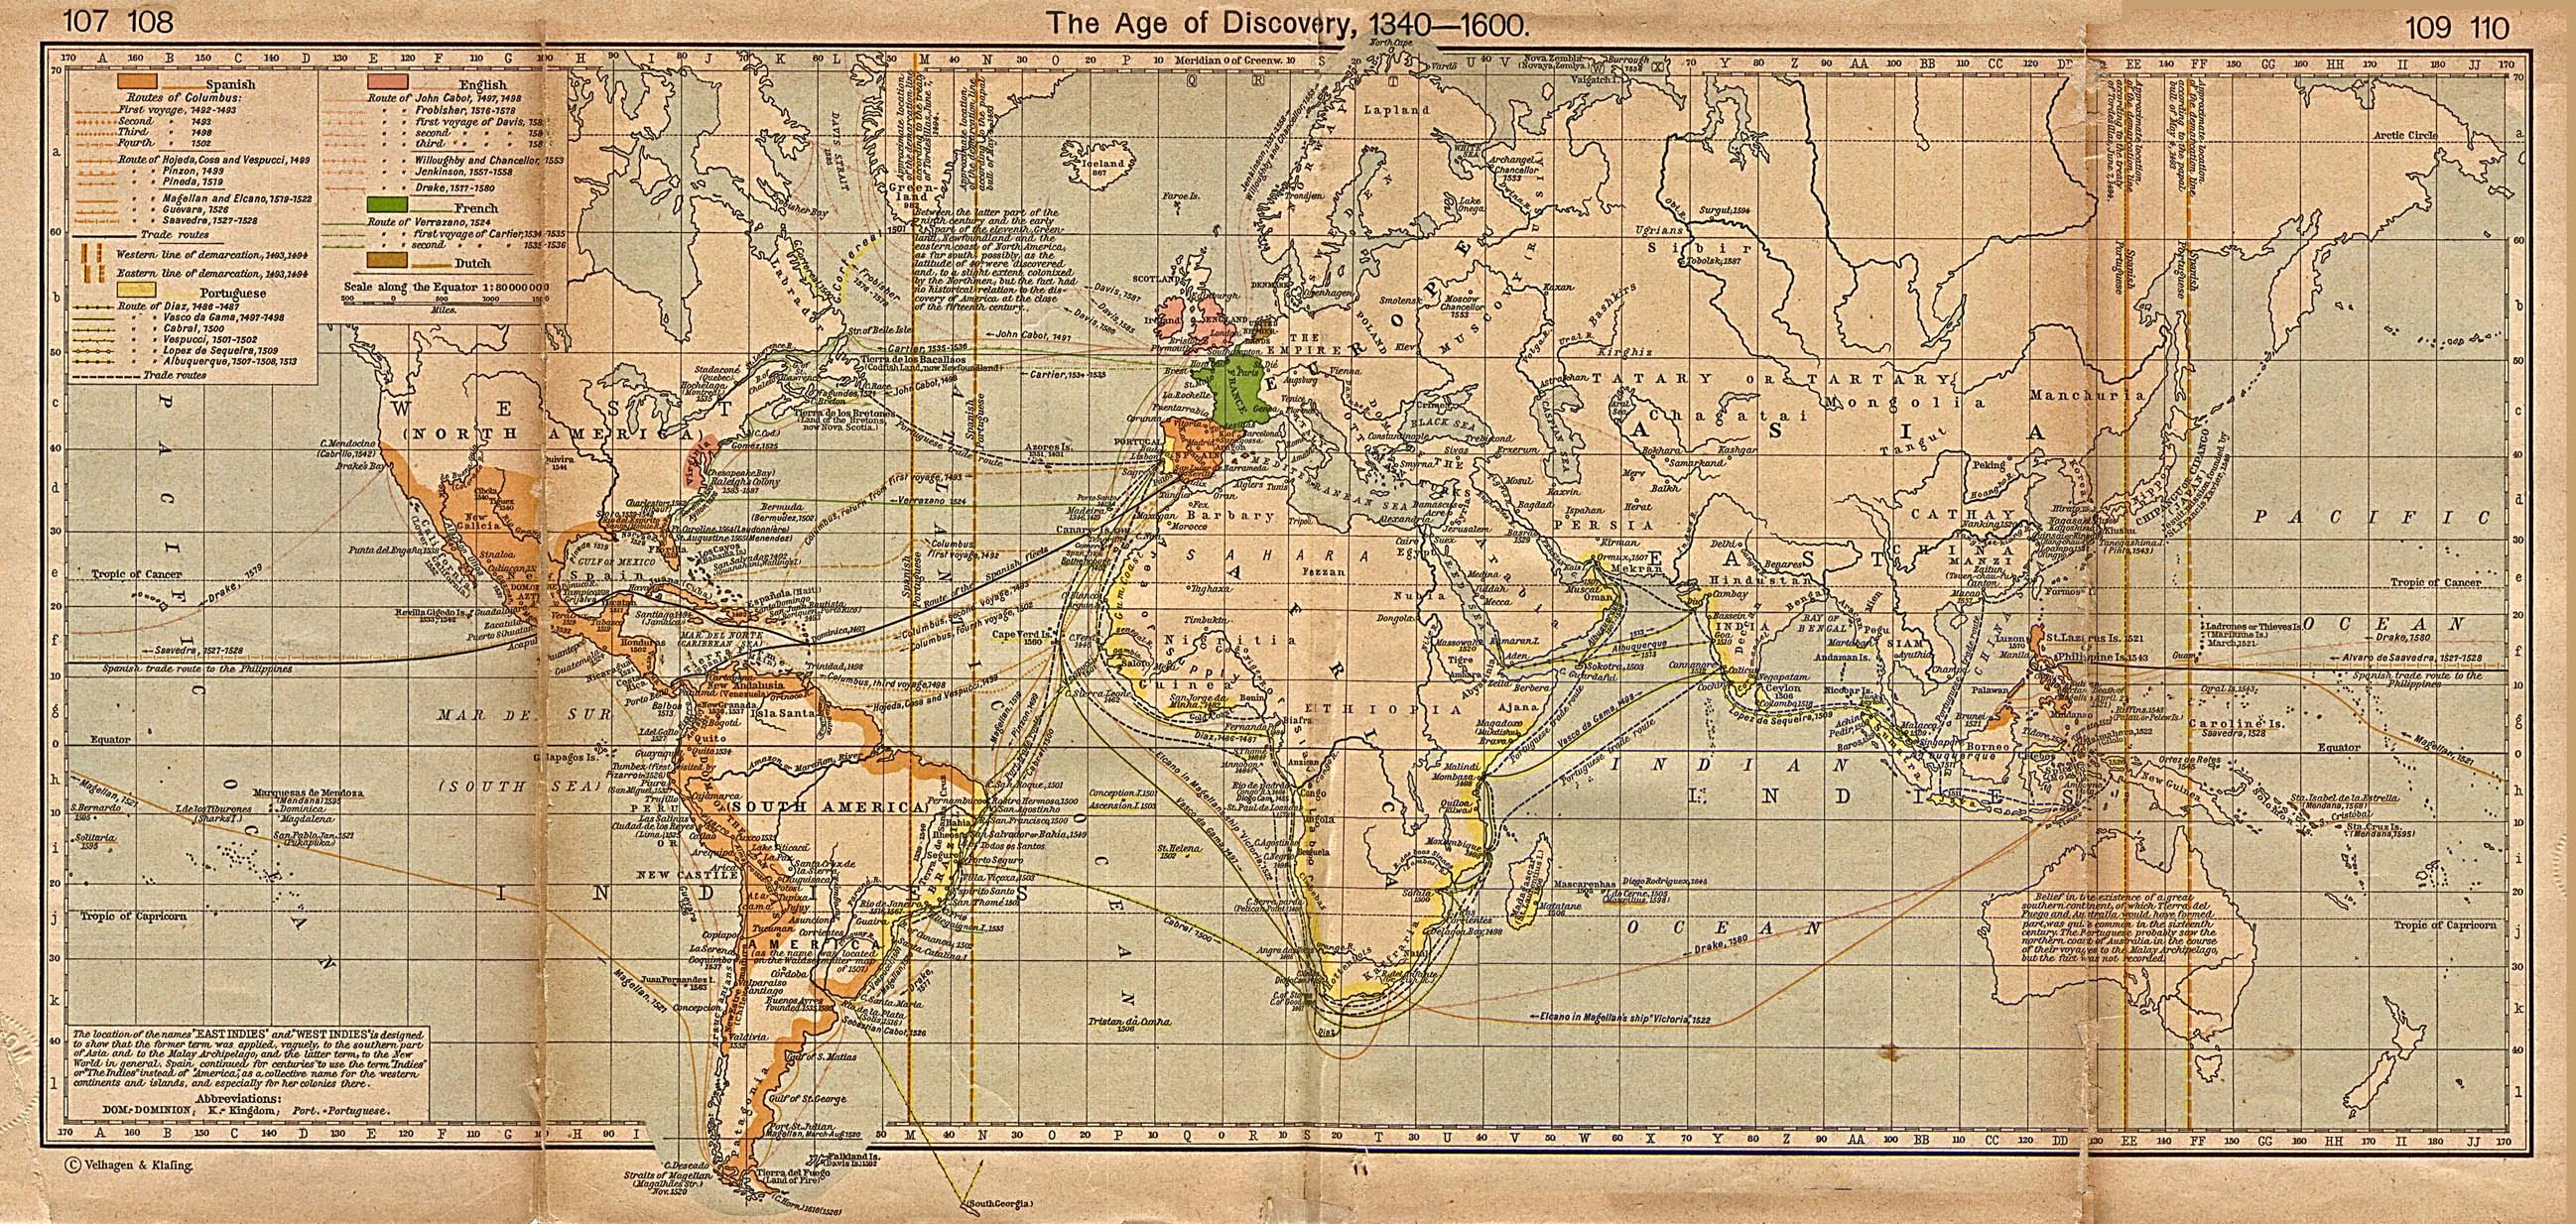 General World History